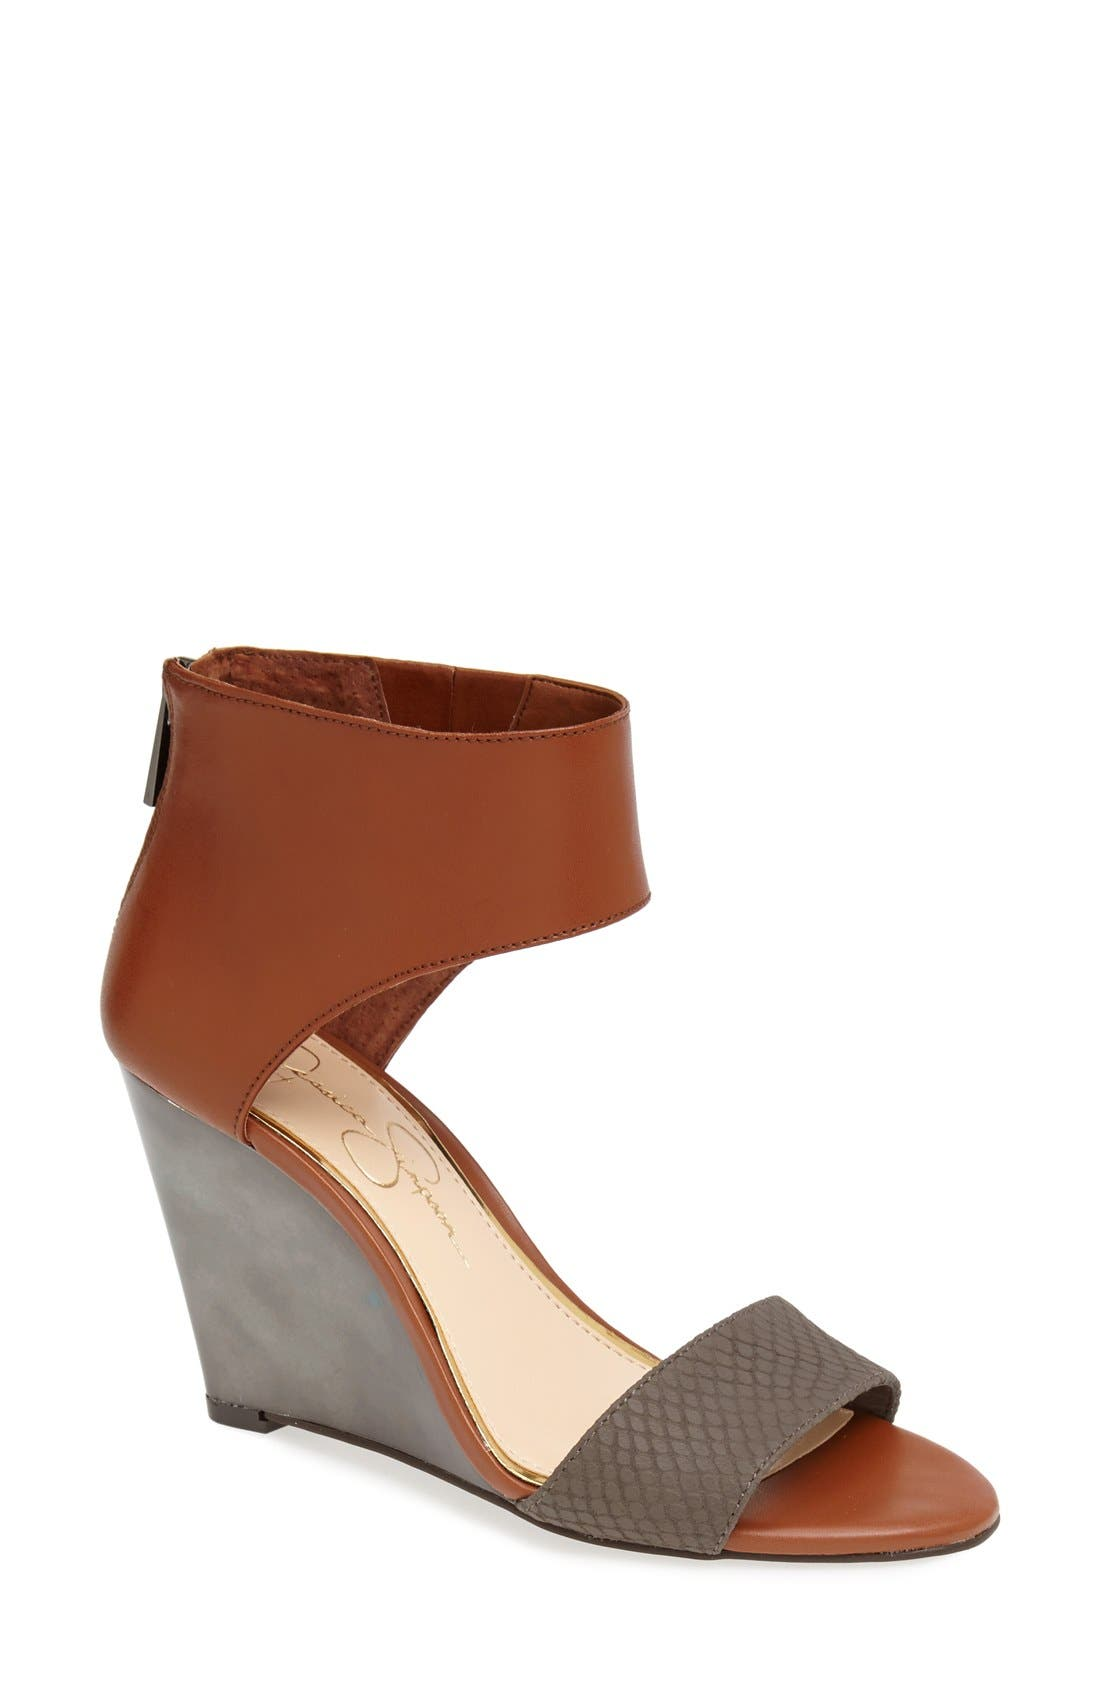 Alternate Image 1 Selected - Jessica Simpson 'Mera' Sandal (Women)